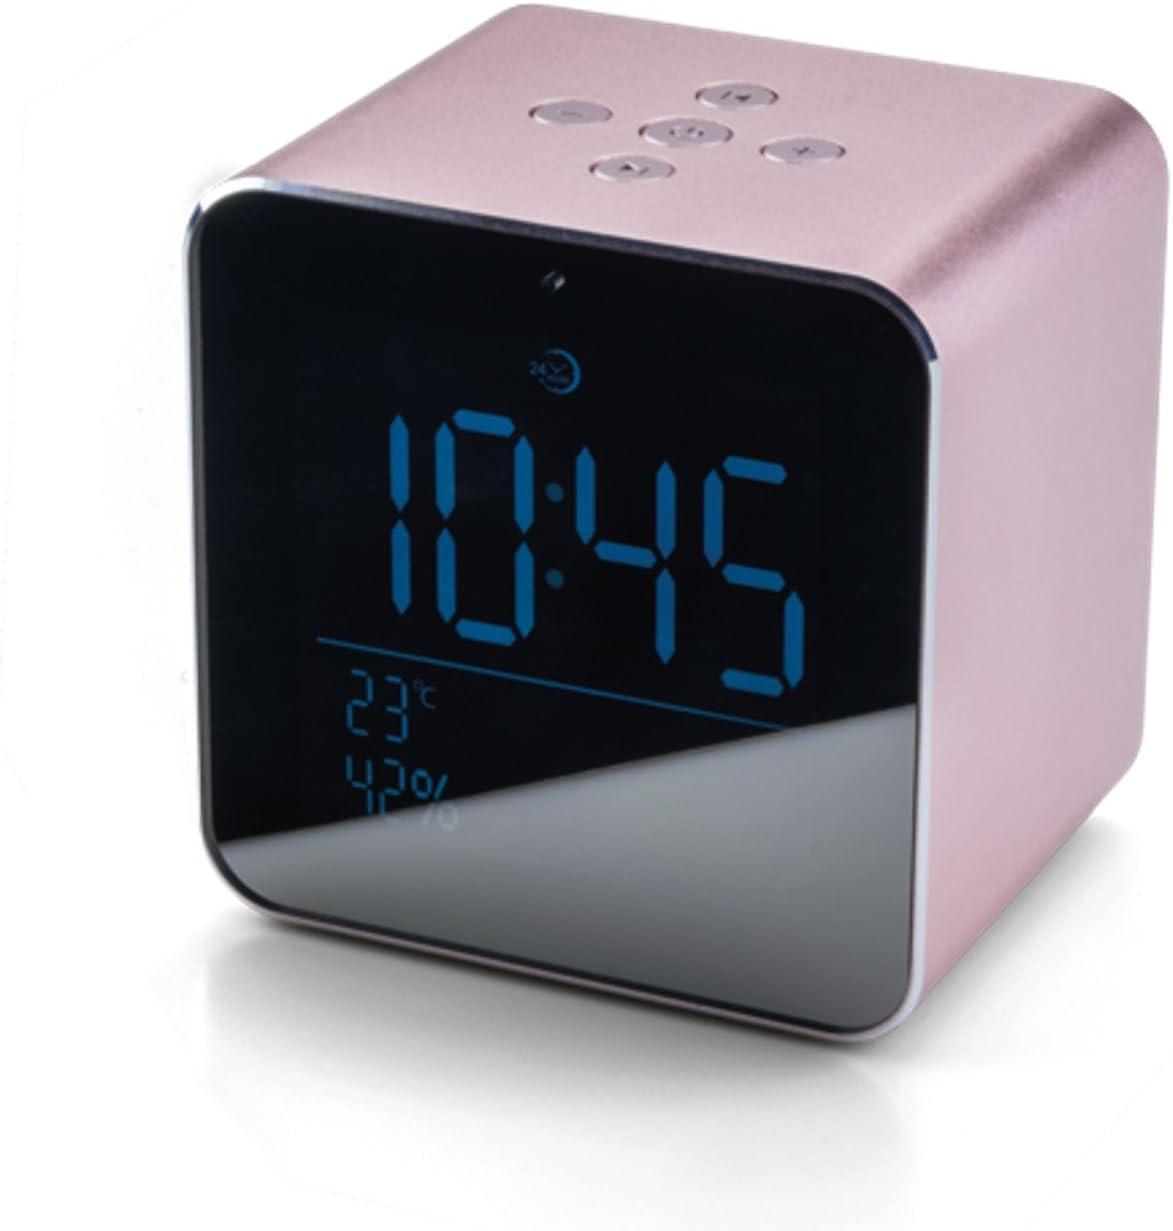 Daewoo DBT-305PK Altavoz Bluetooth con Reloj - Color Rosa Metalizado, Pequeno